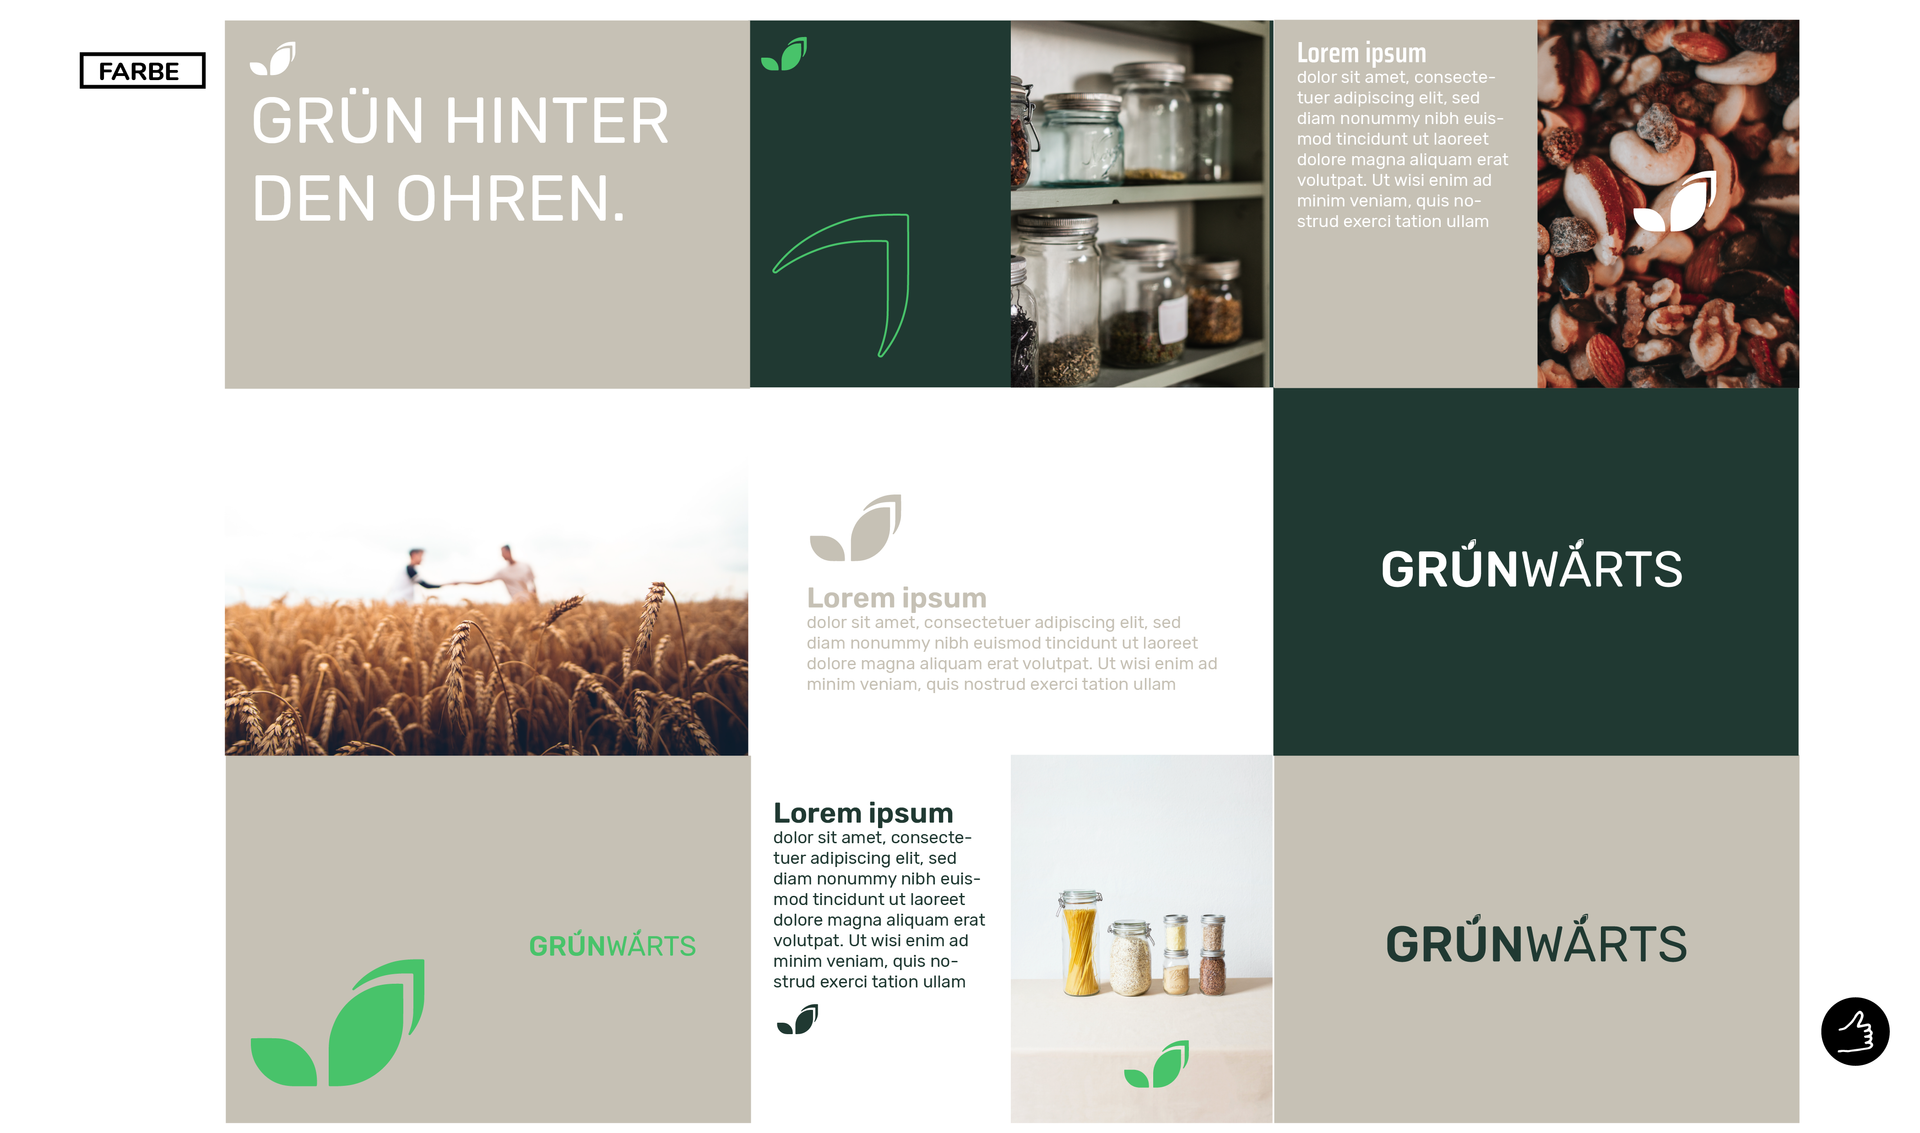 gruenwaerts(2)-Farbe3.png